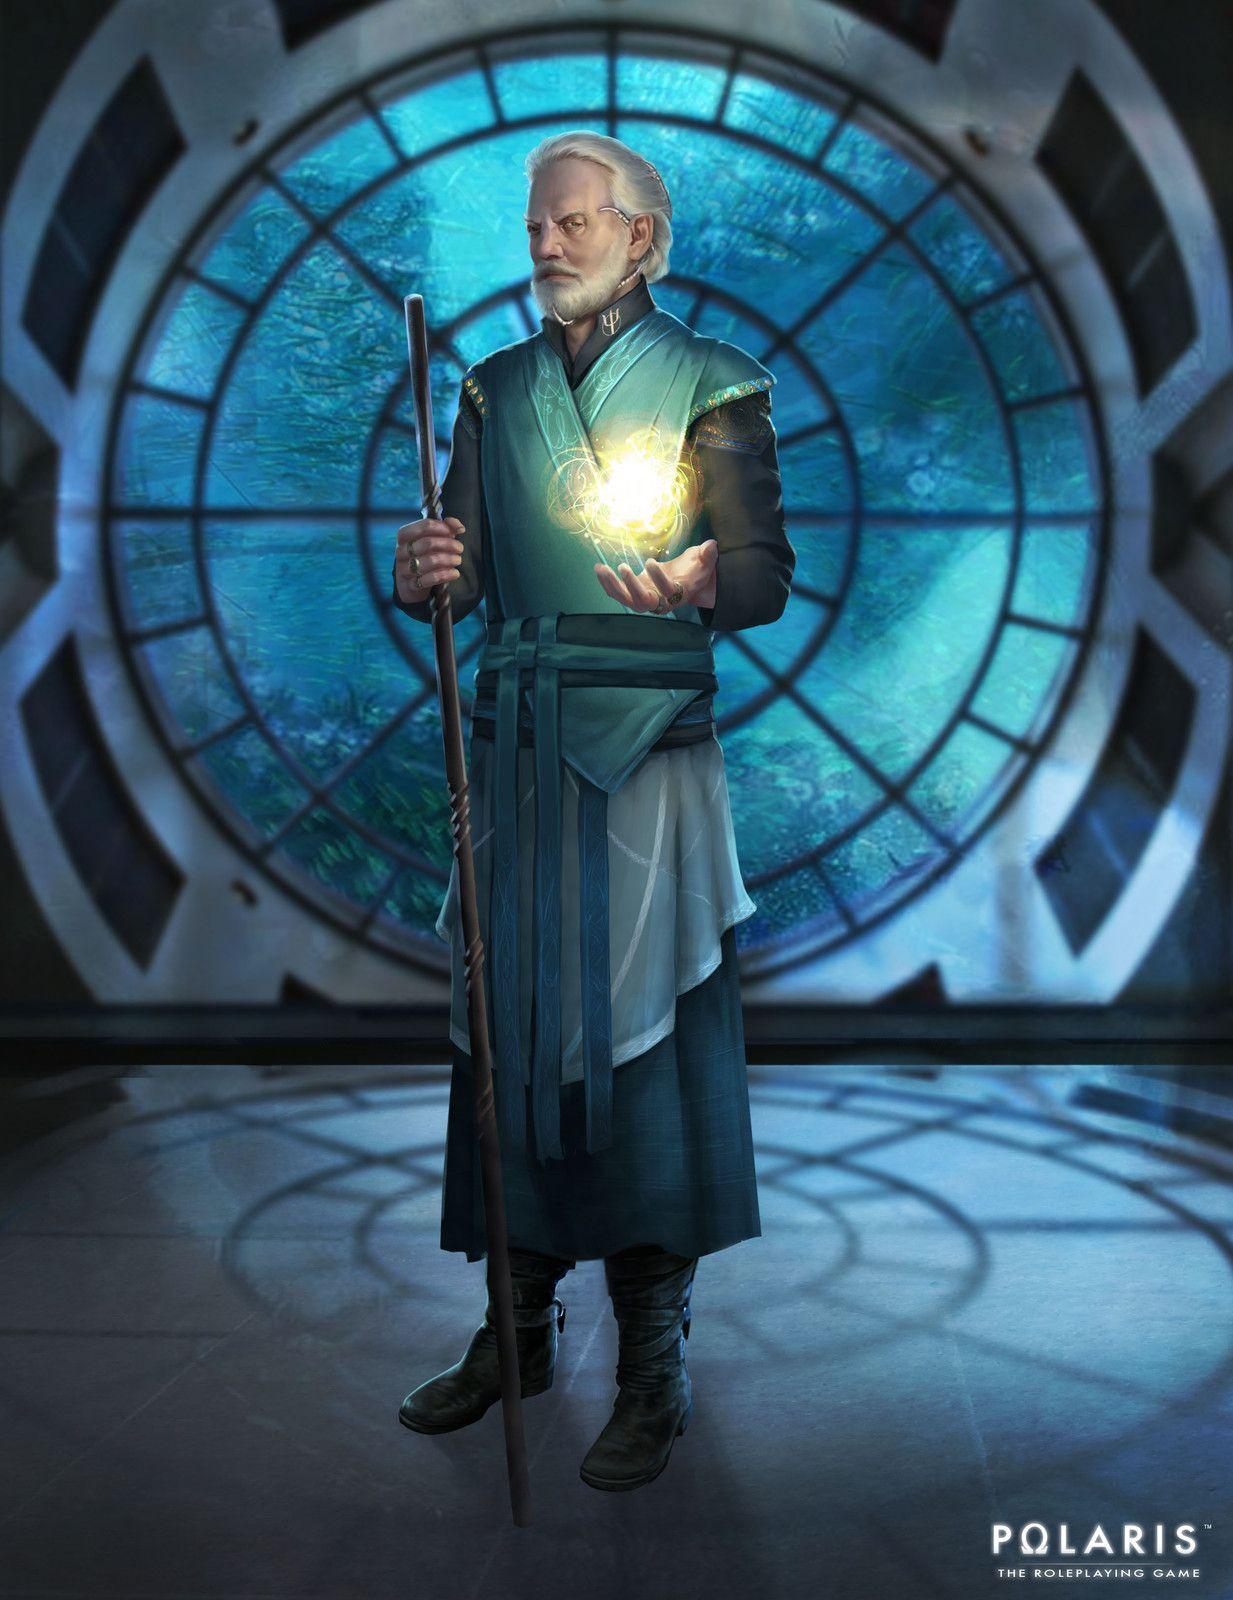 Priest of the Trident, stephanie böhm on ArtStation at https://www.artstation.com/artwork/xqm0O